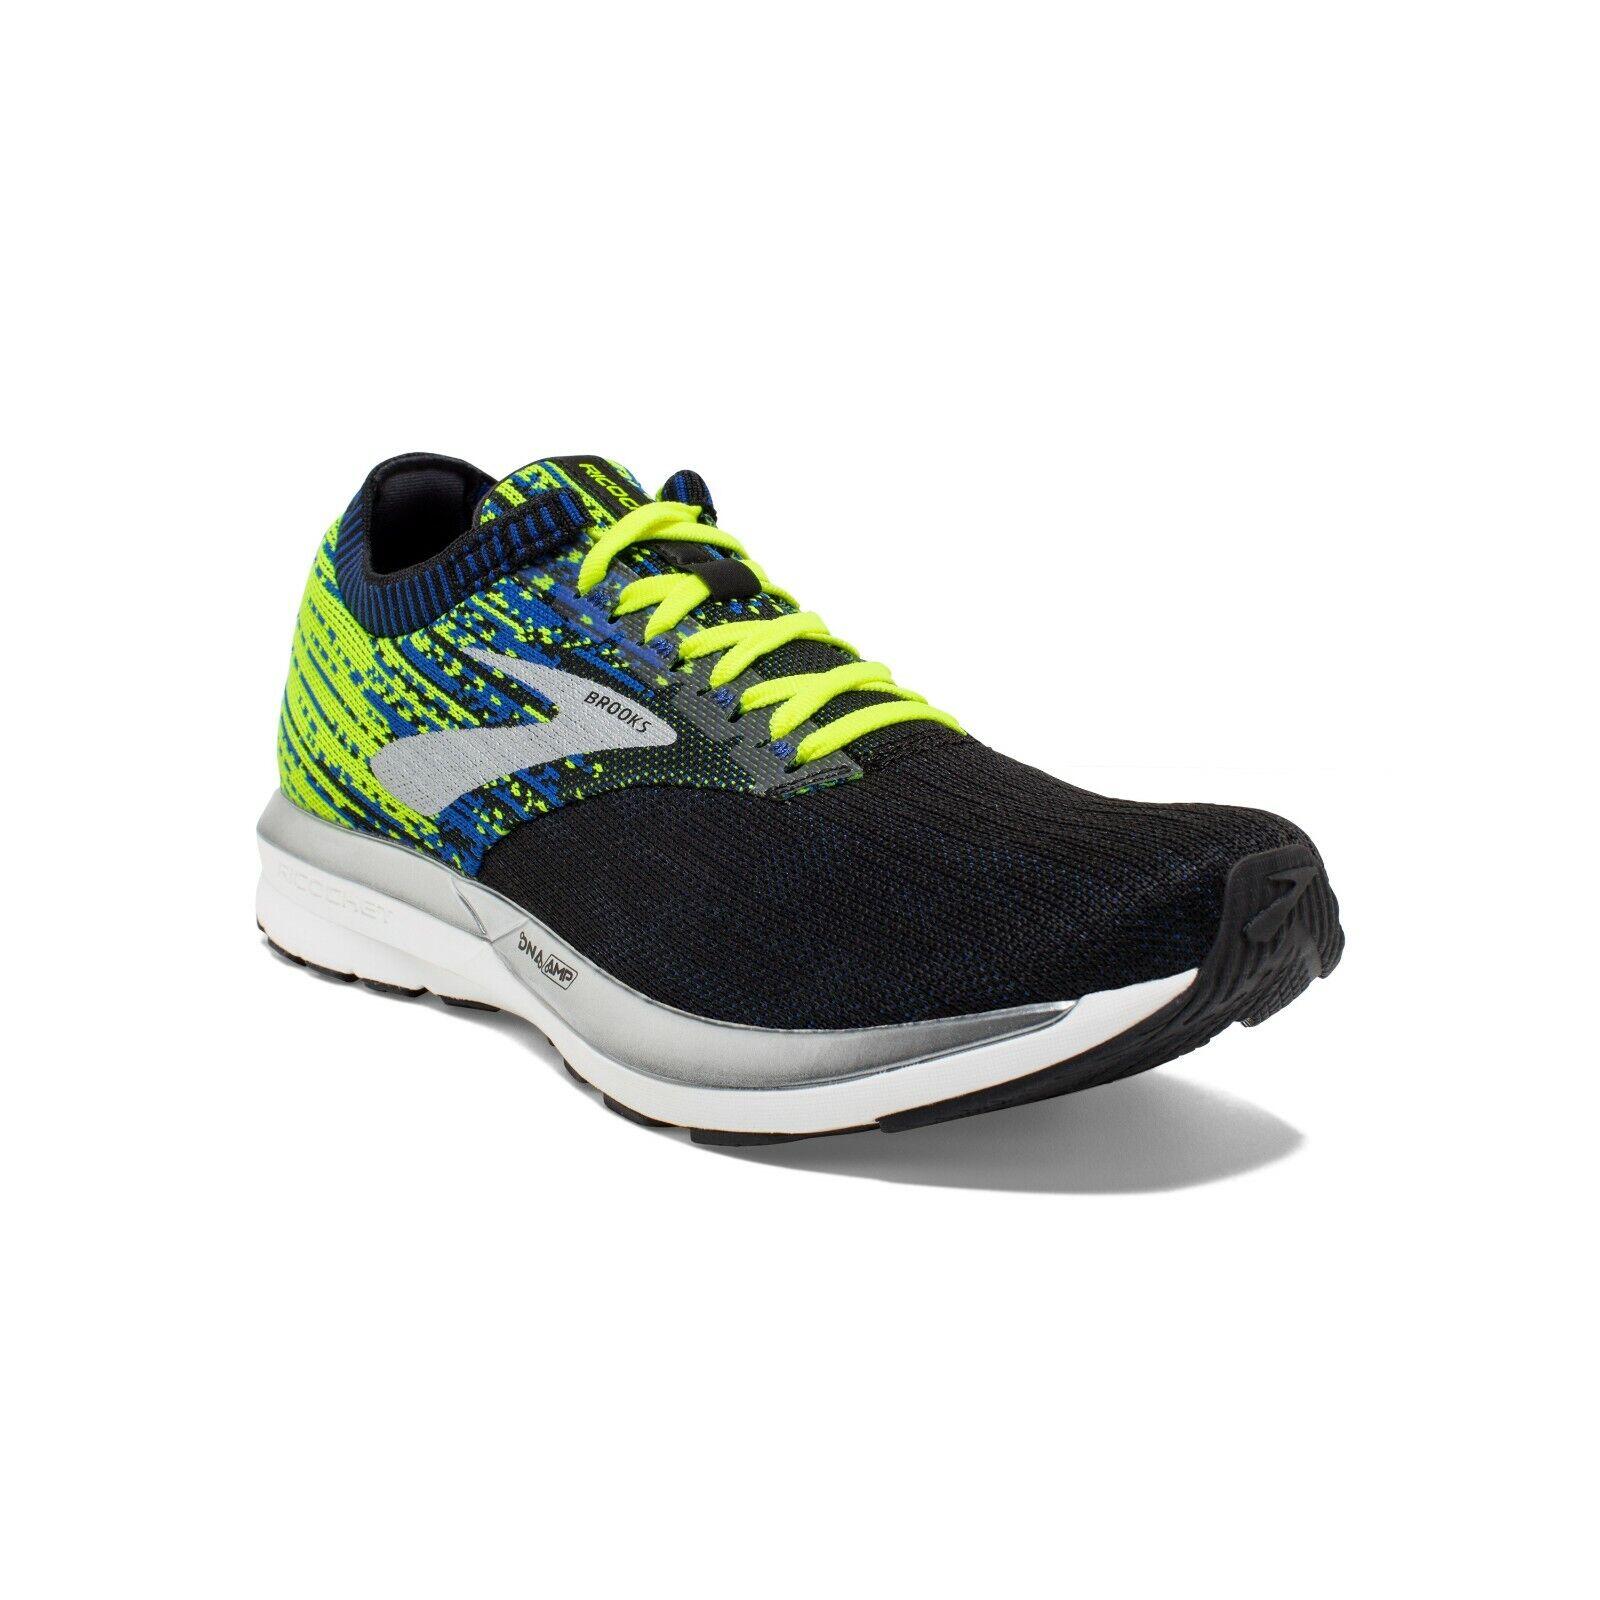 BROOKS RICOCHET chaussures FonctionneHommest hommes Neutral Energize bleu NIGHTLIFE 110293 004